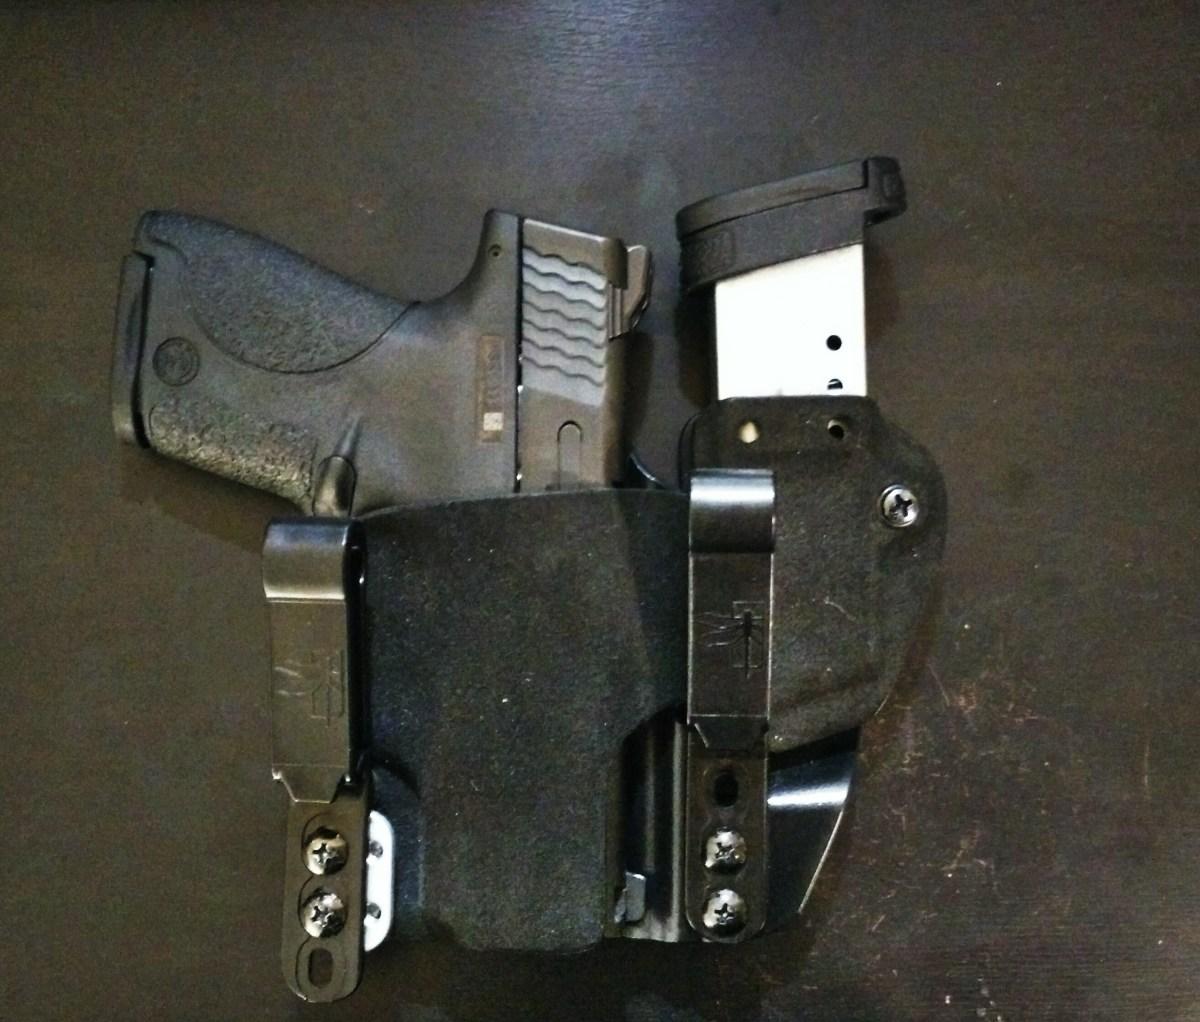 Modifying HSP INCOG Holster Mag Caddy